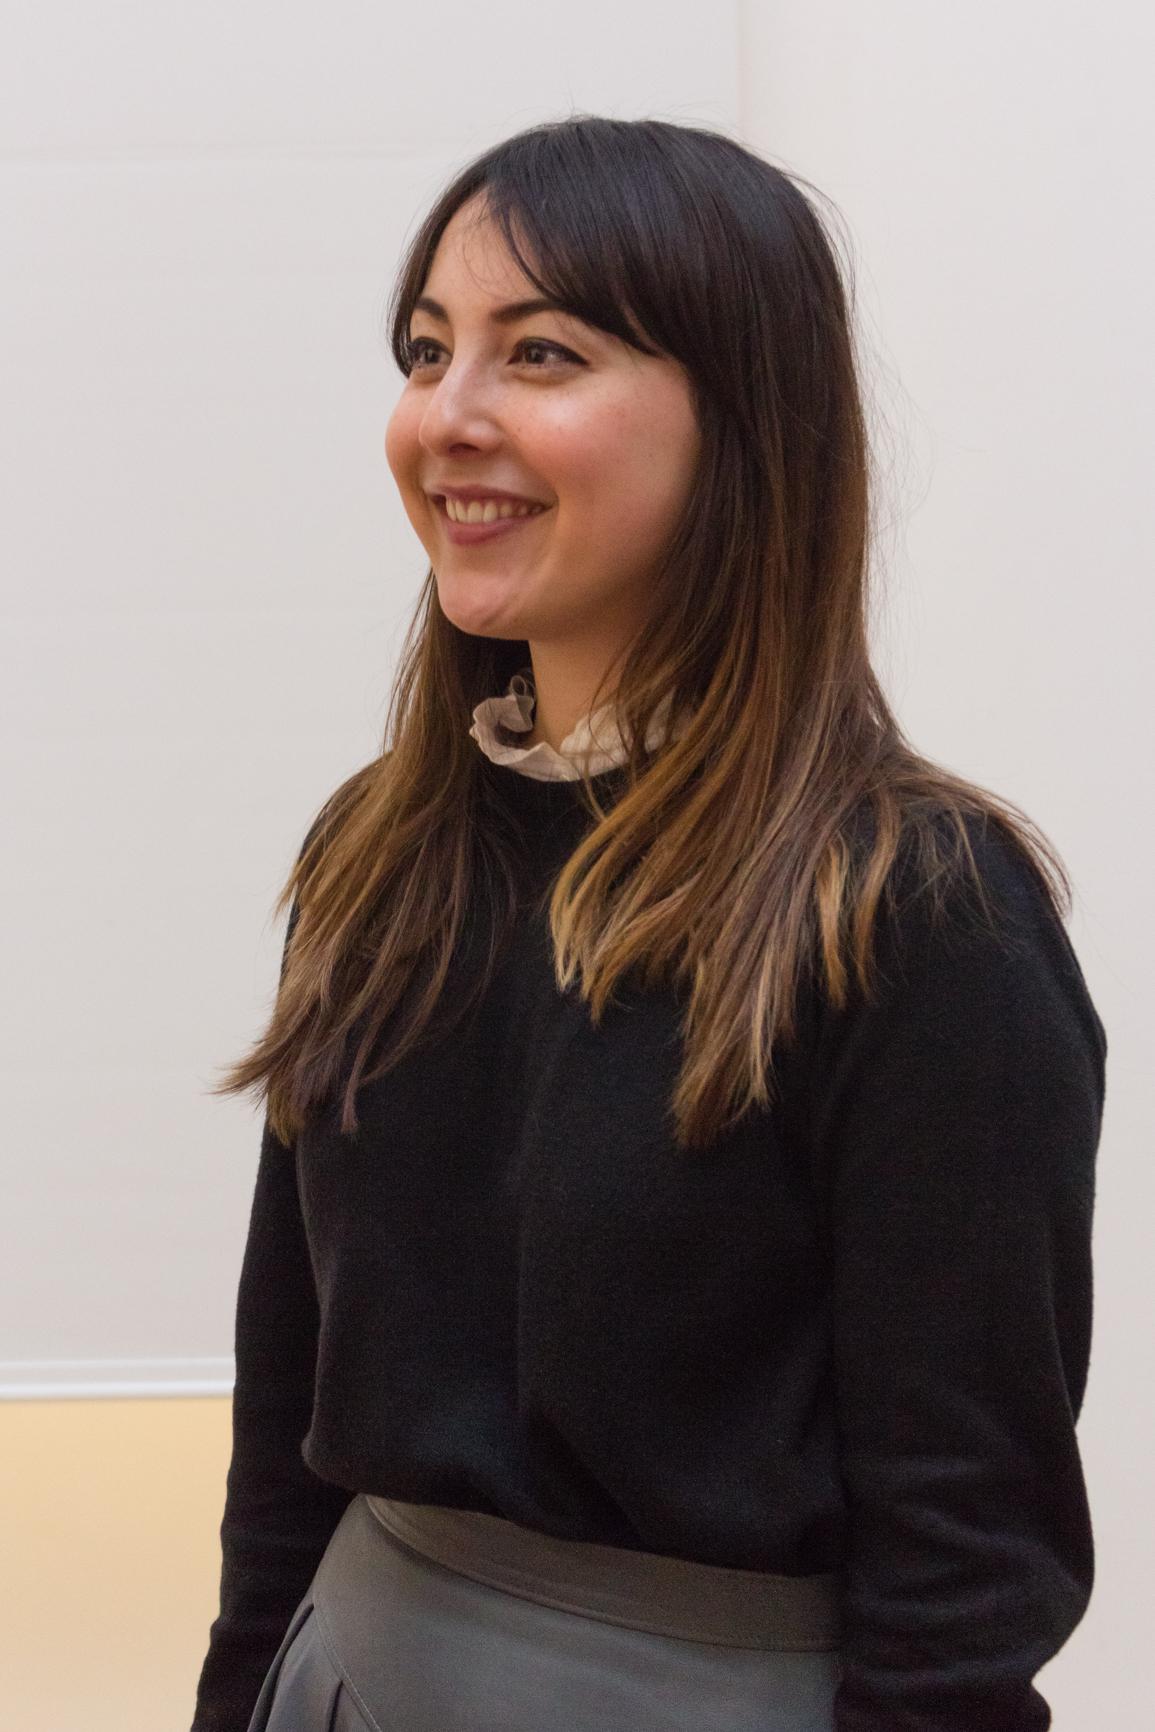 Sara Lee-ling Chan